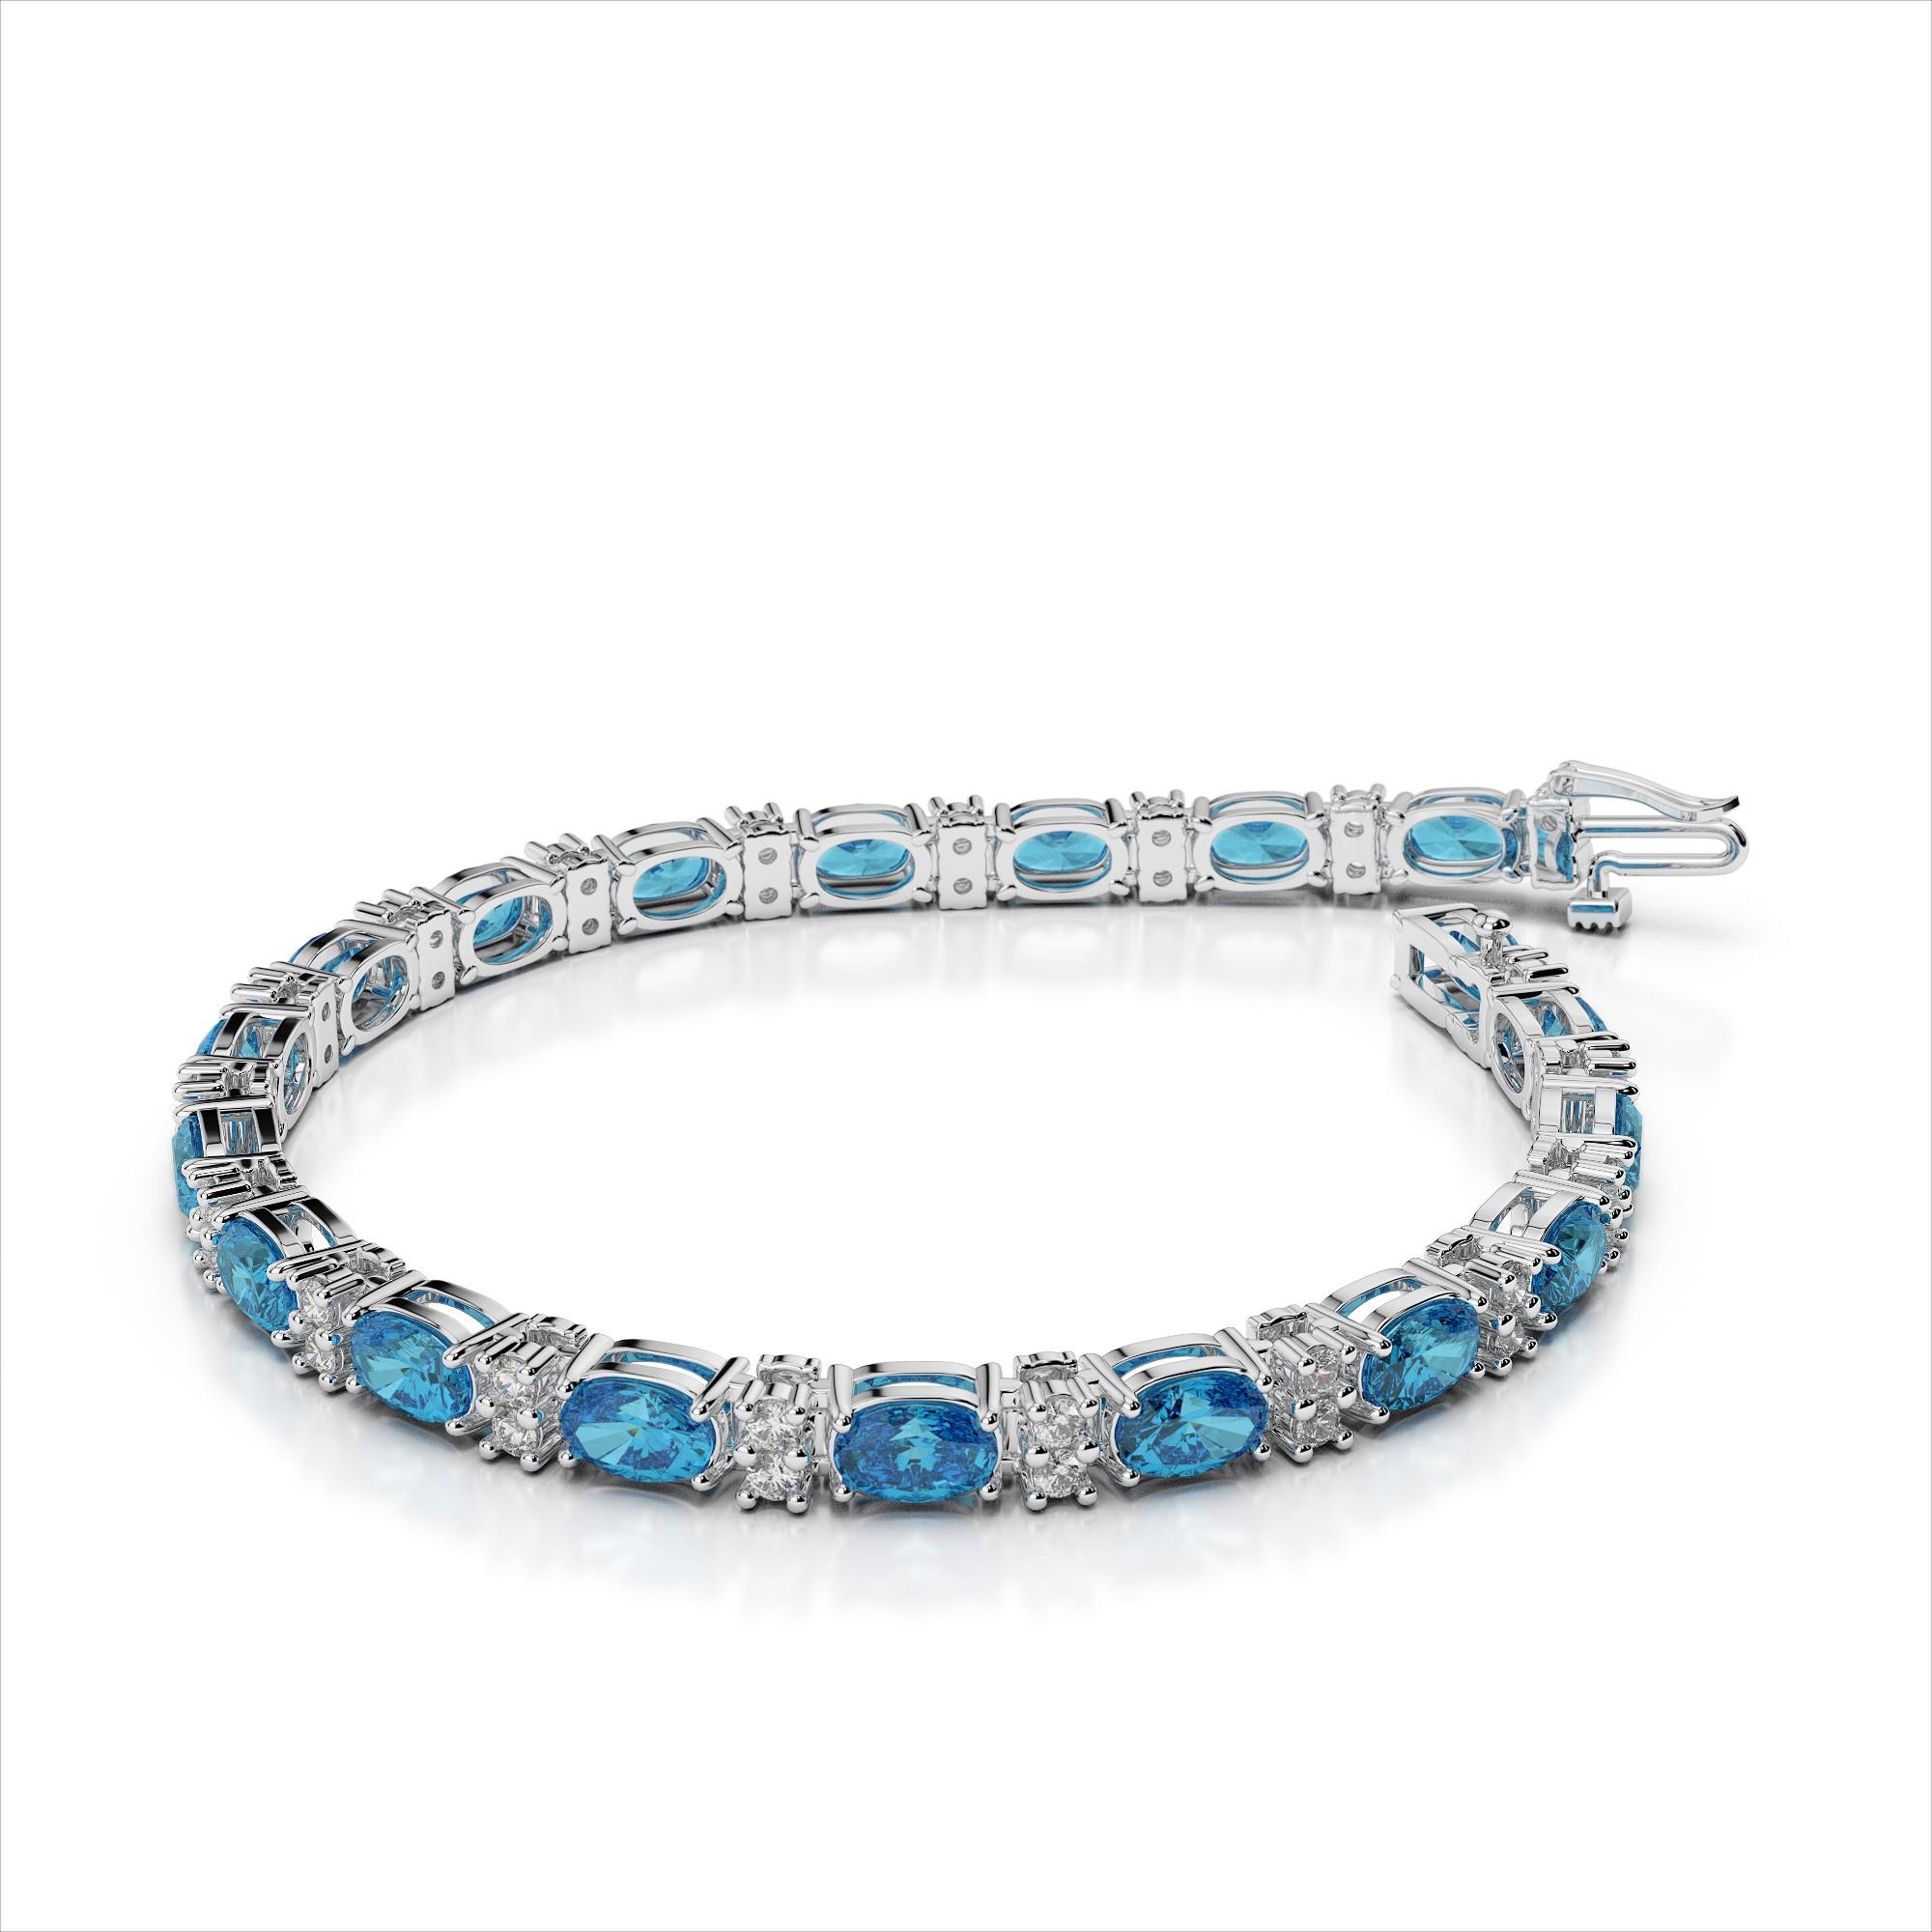 Oval 5x3mm Gemstone and Diamond Bracelet